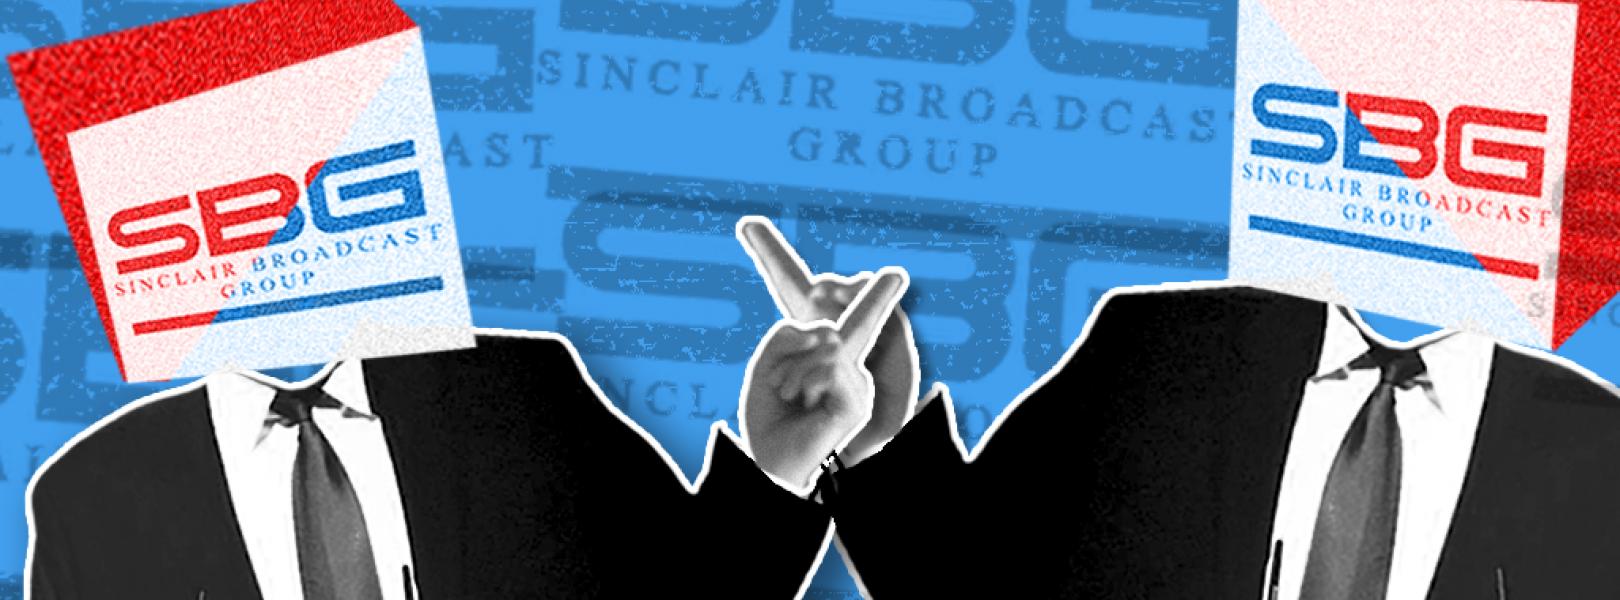 Sinclair Broadcast Group on Vaccine Politics